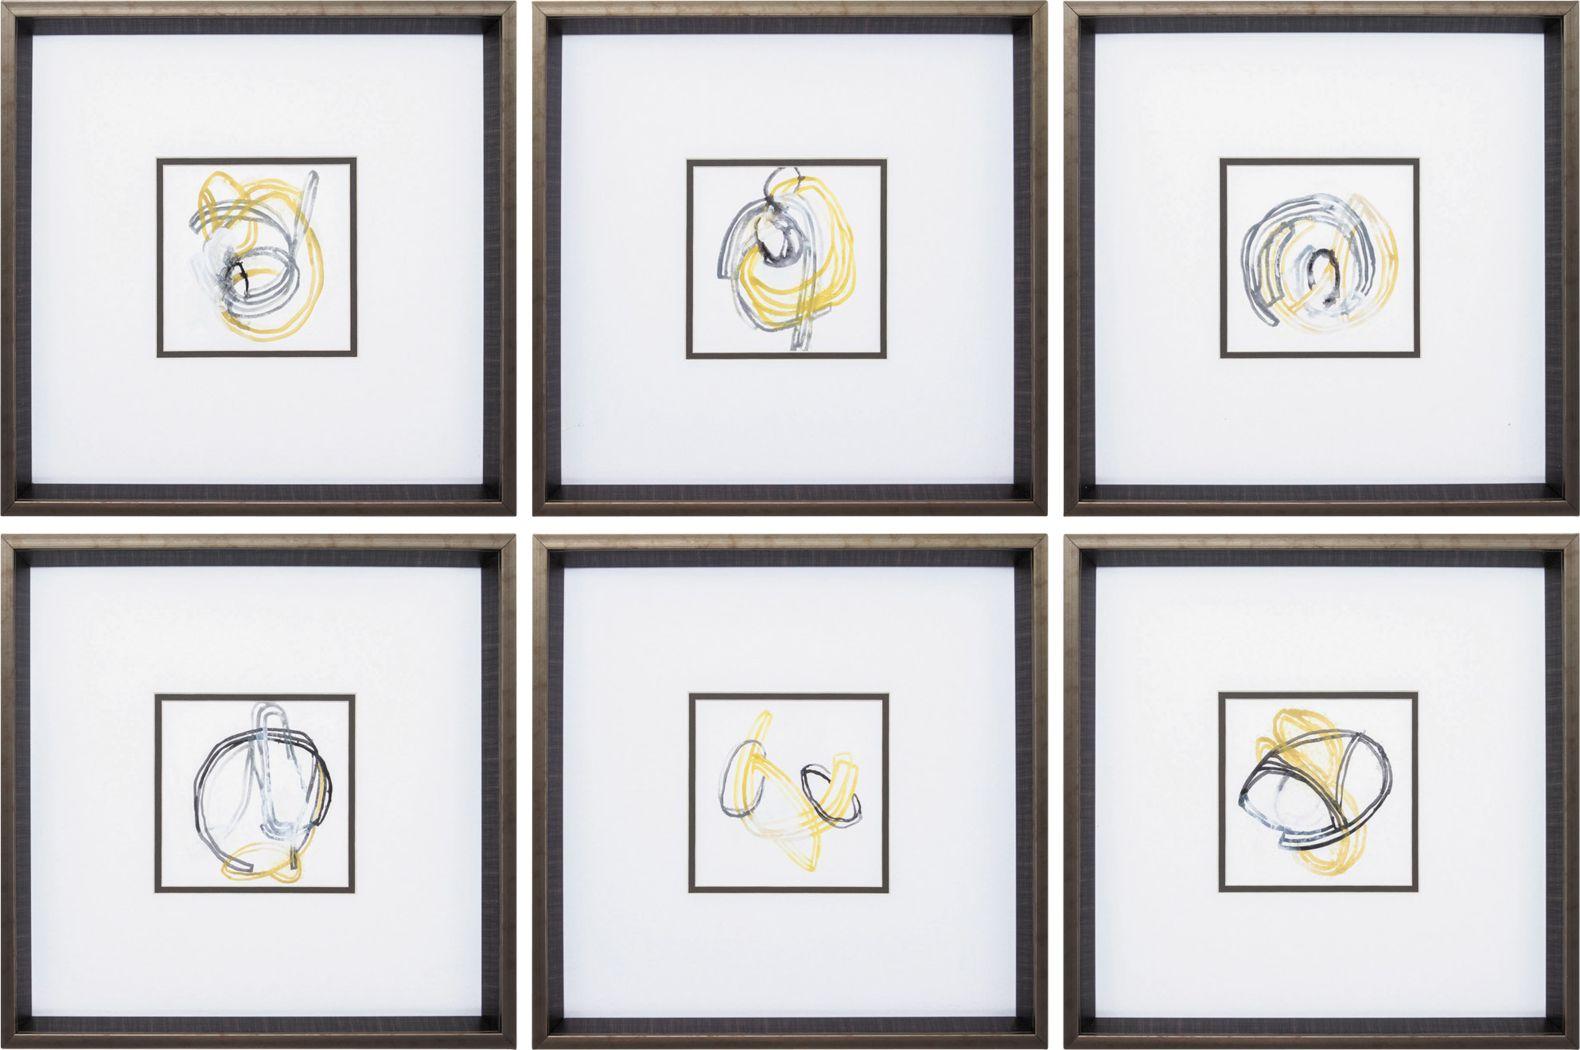 String Orbit Set of 6 Artwork